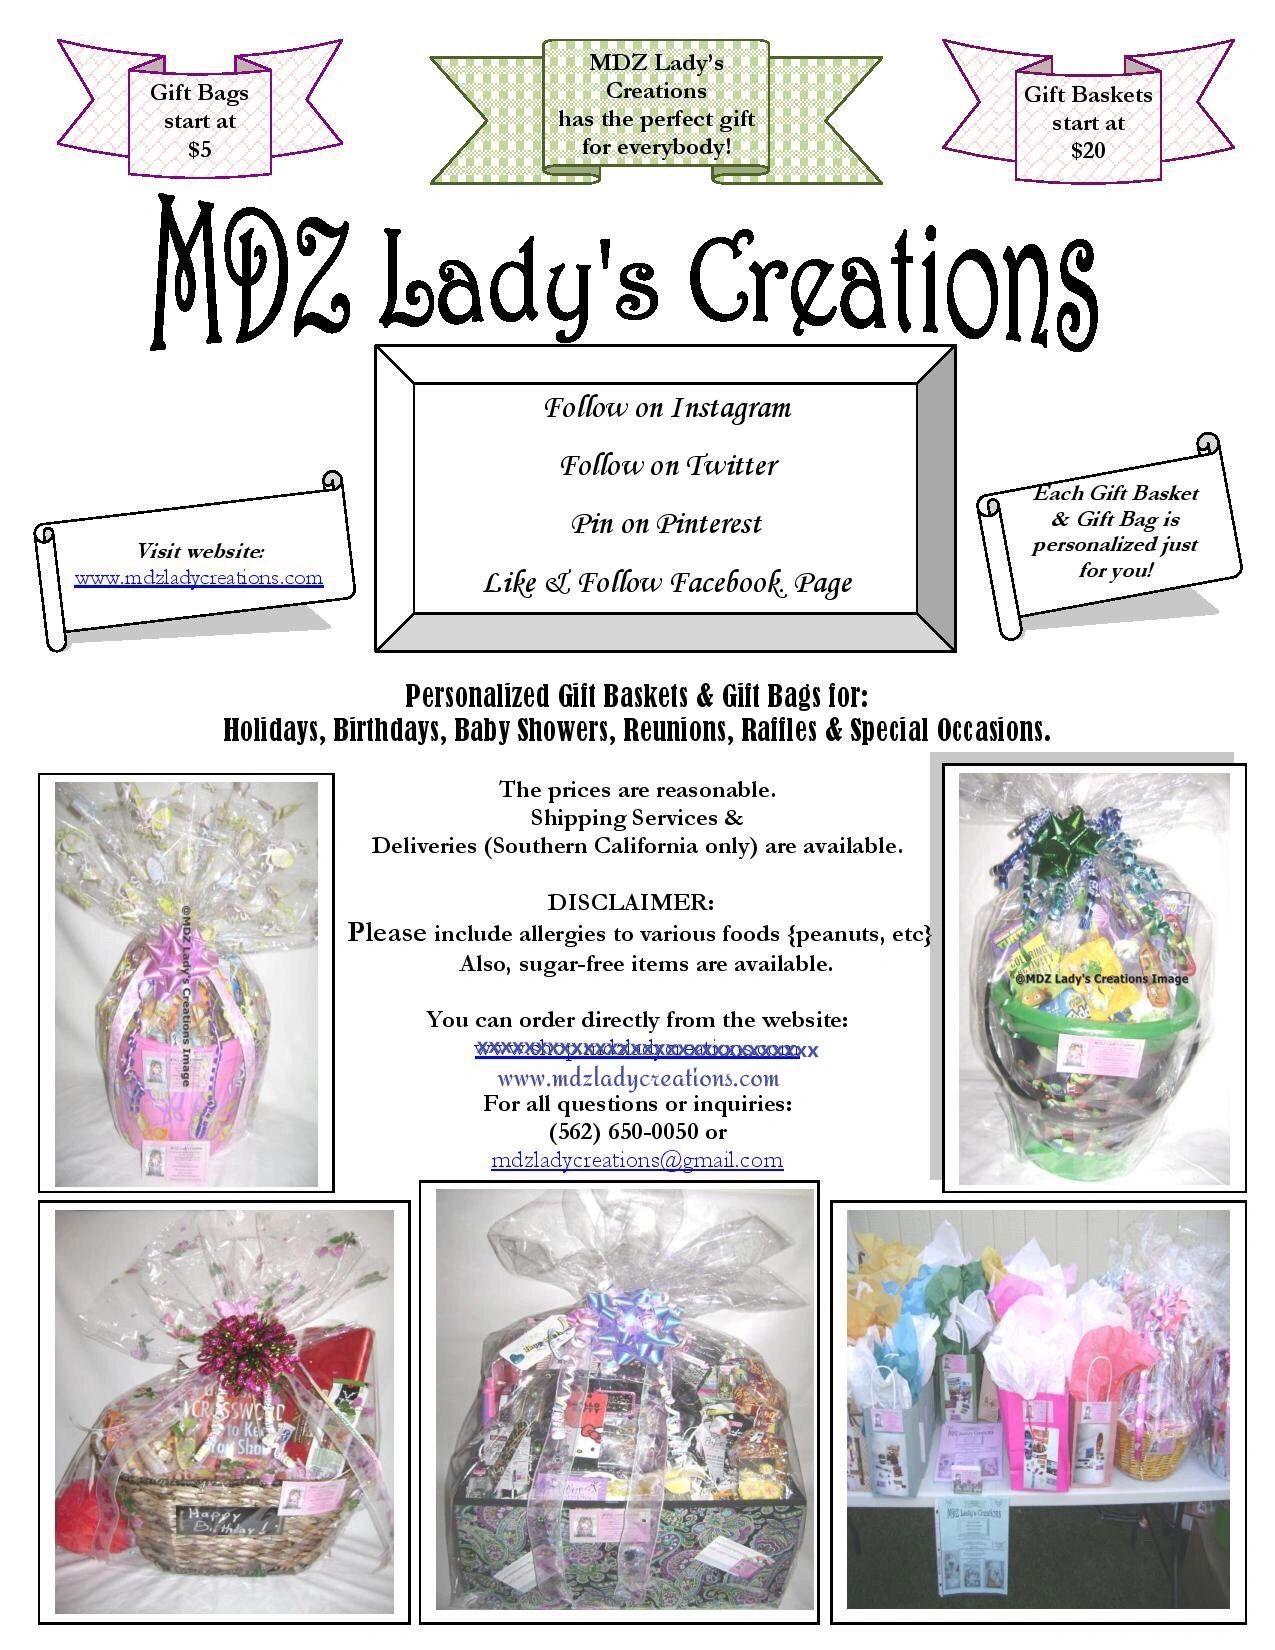 MDZ Lady's Creations®